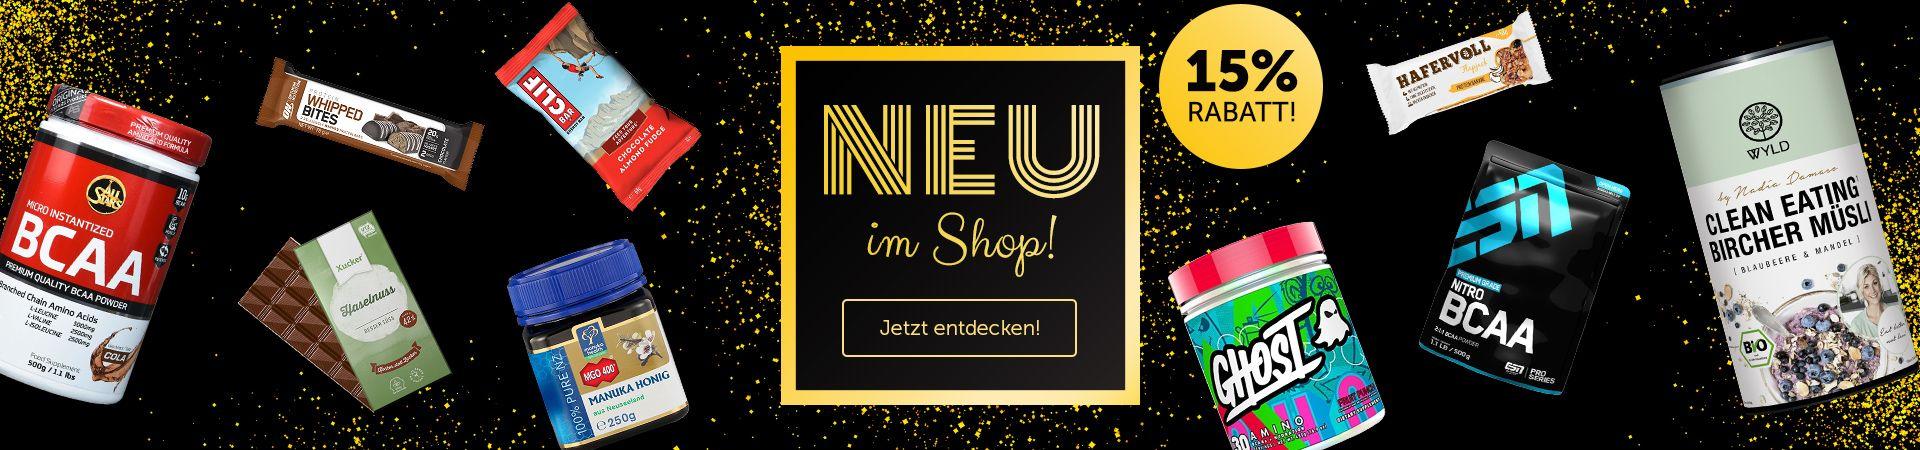 20181108_Neu im Shop_15proz